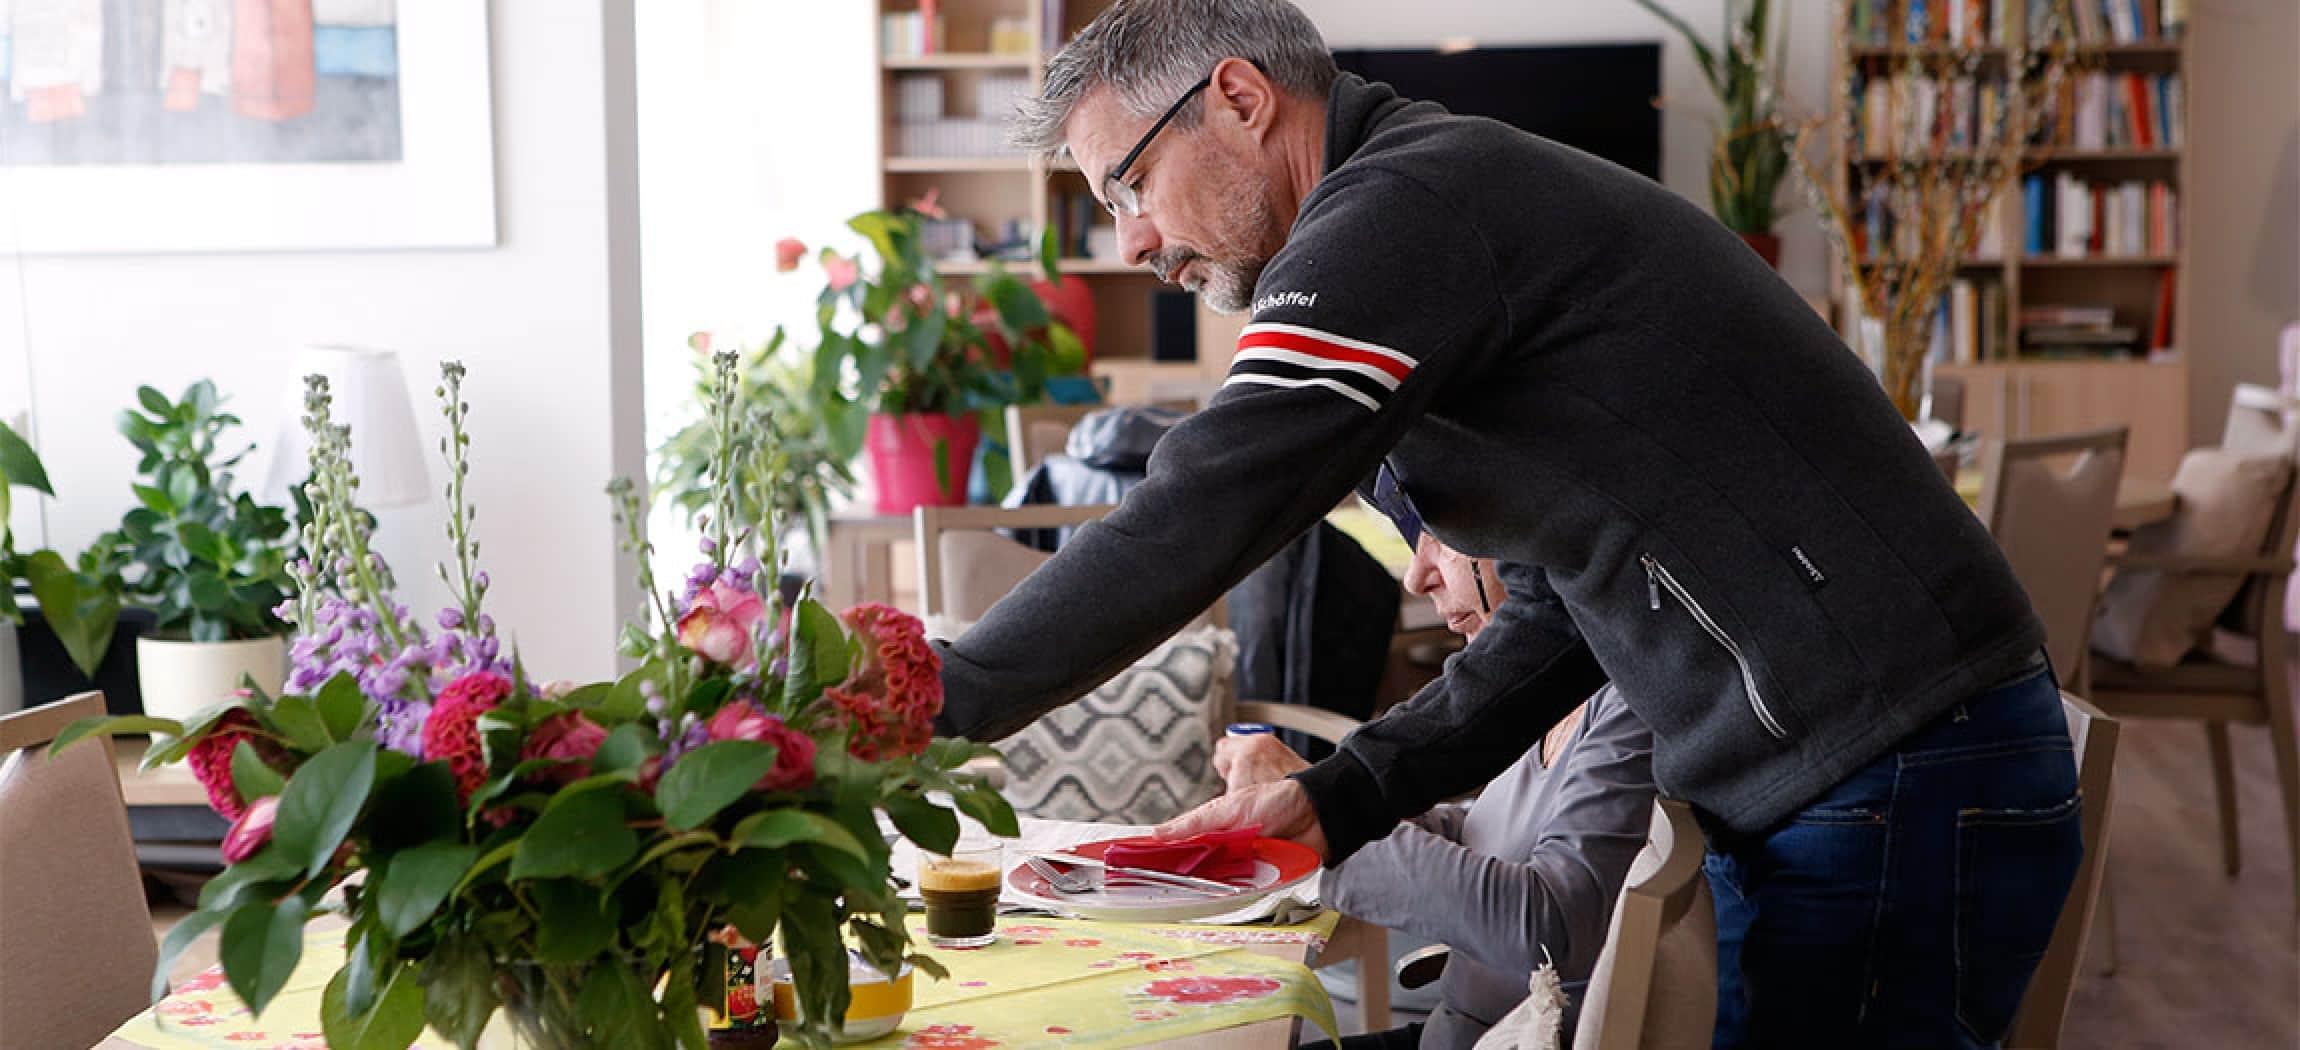 Vrijwilliger man helpt bij ontbijttafel in hospice